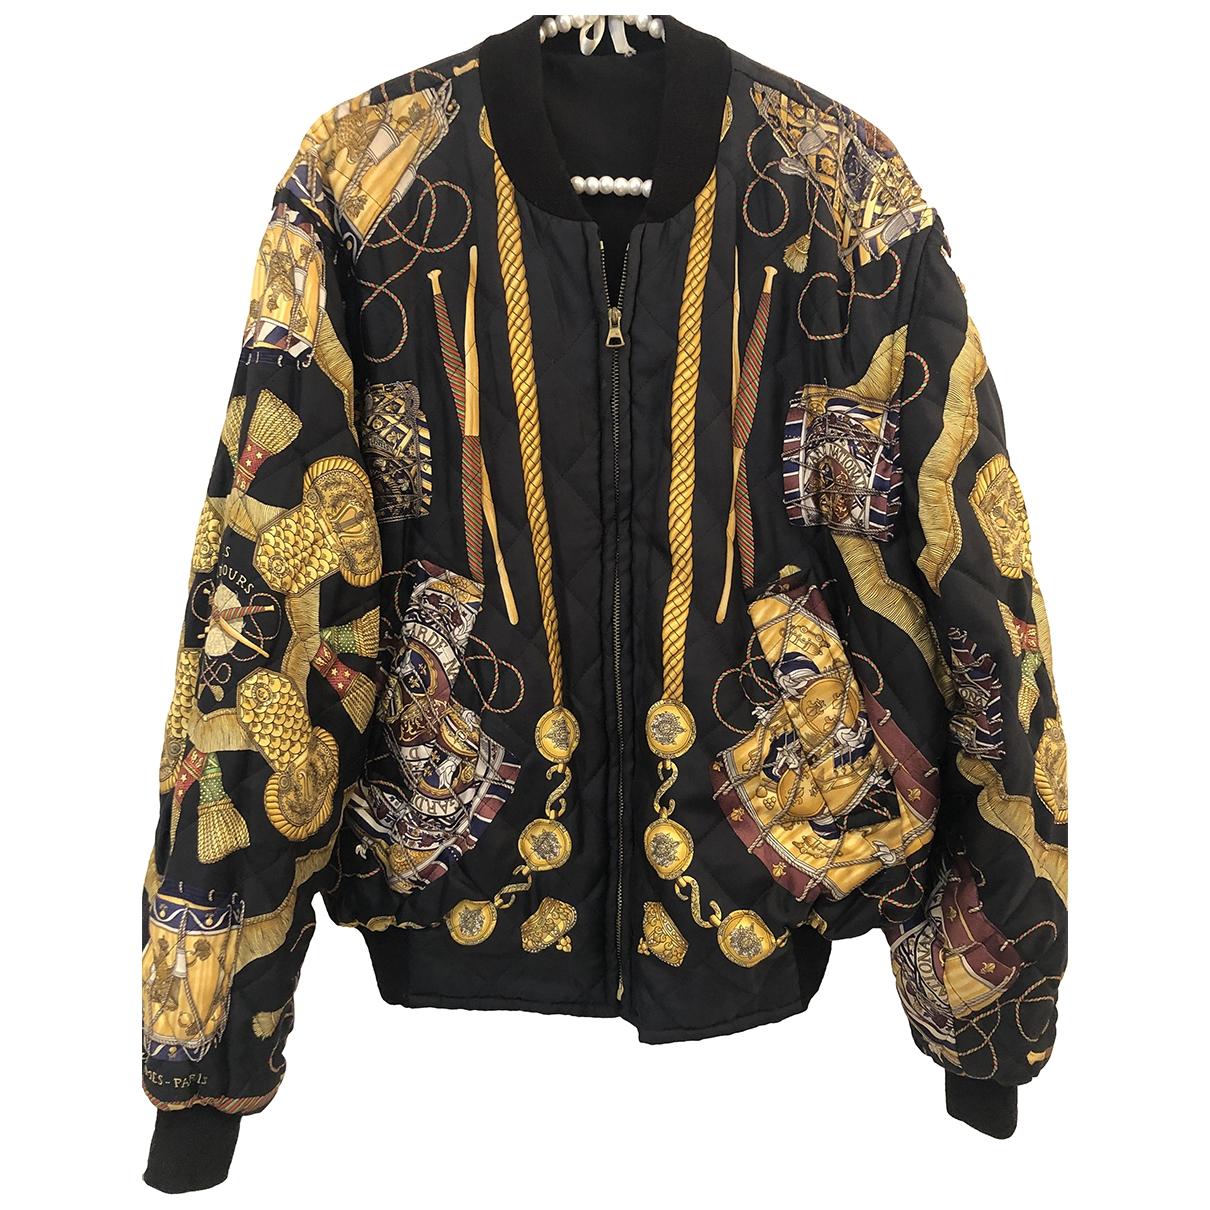 Hermès \N Multicolour Silk jacket for Women One Size FR